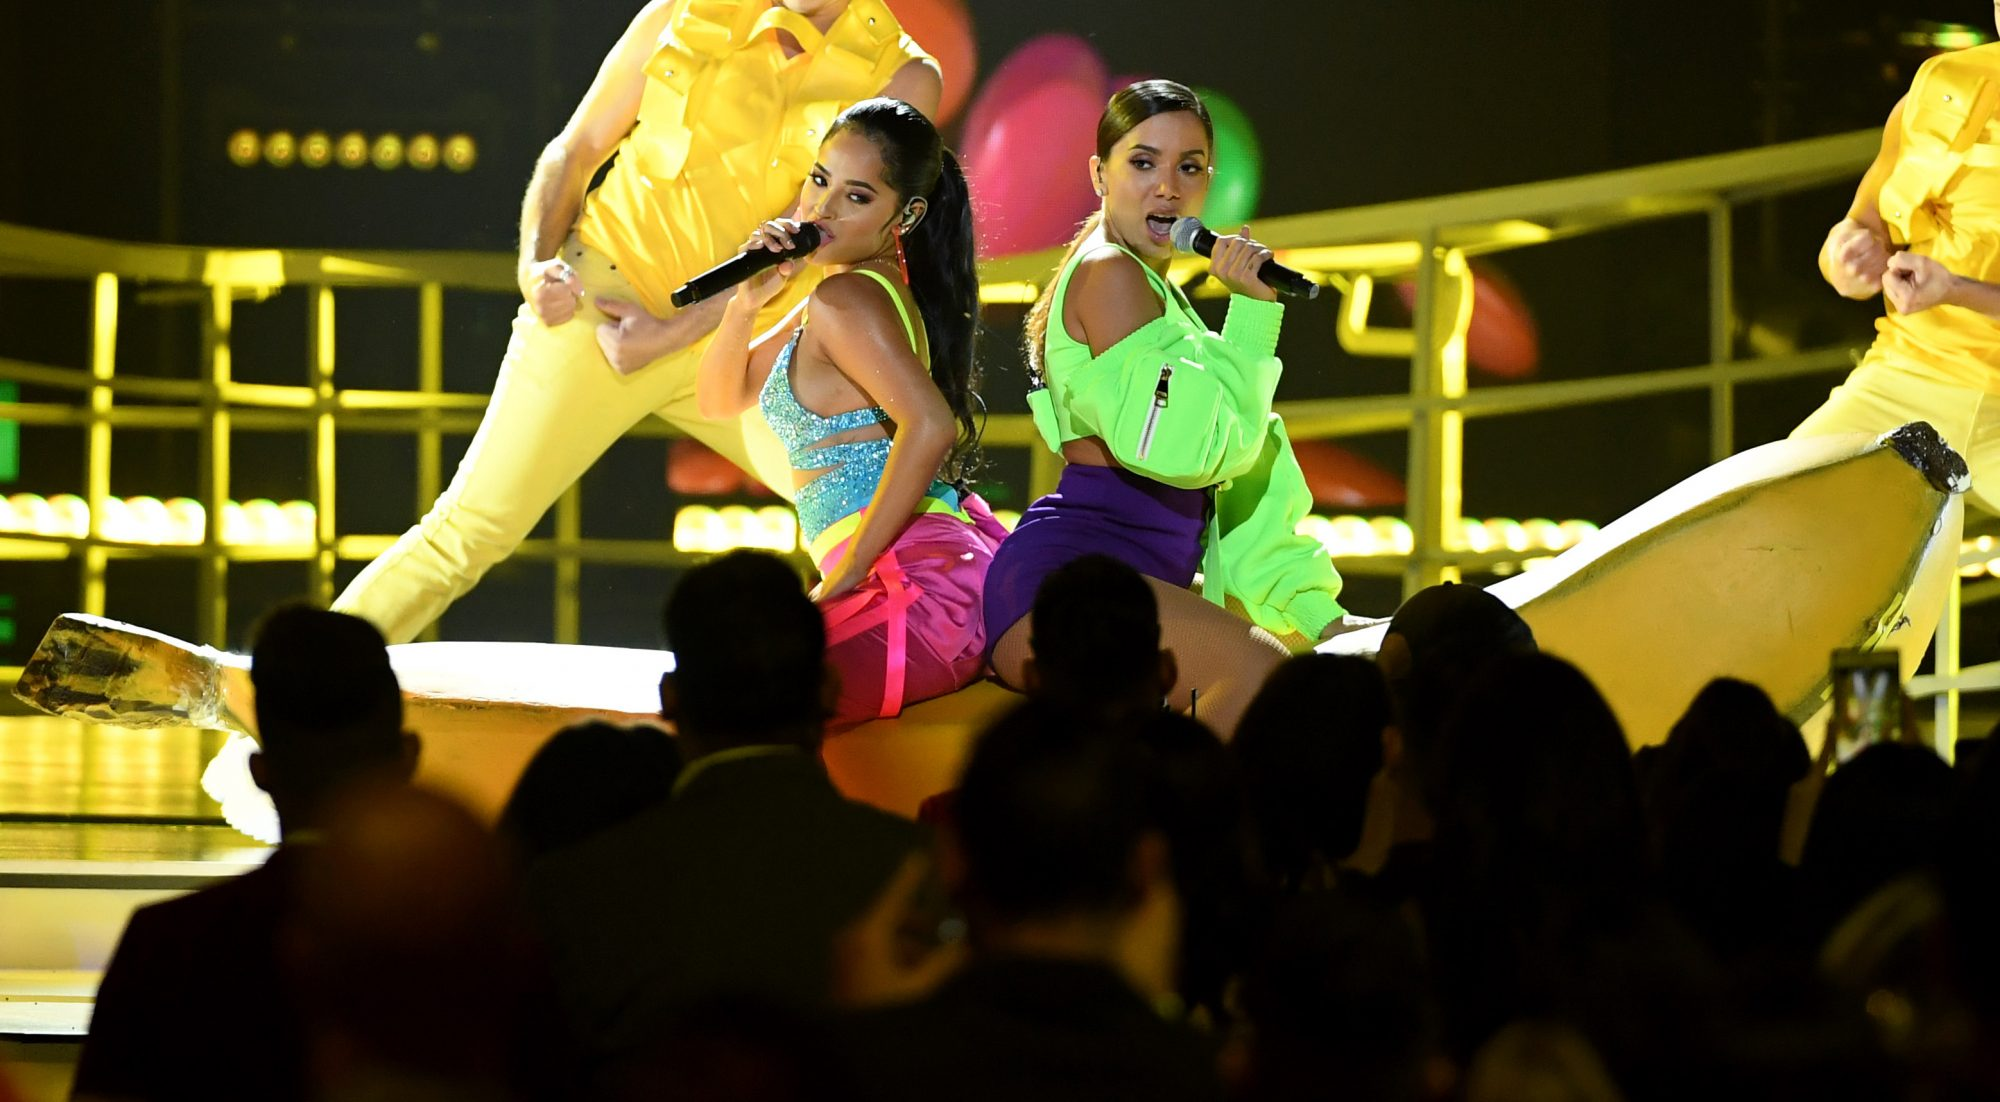 Anitta and Becky G